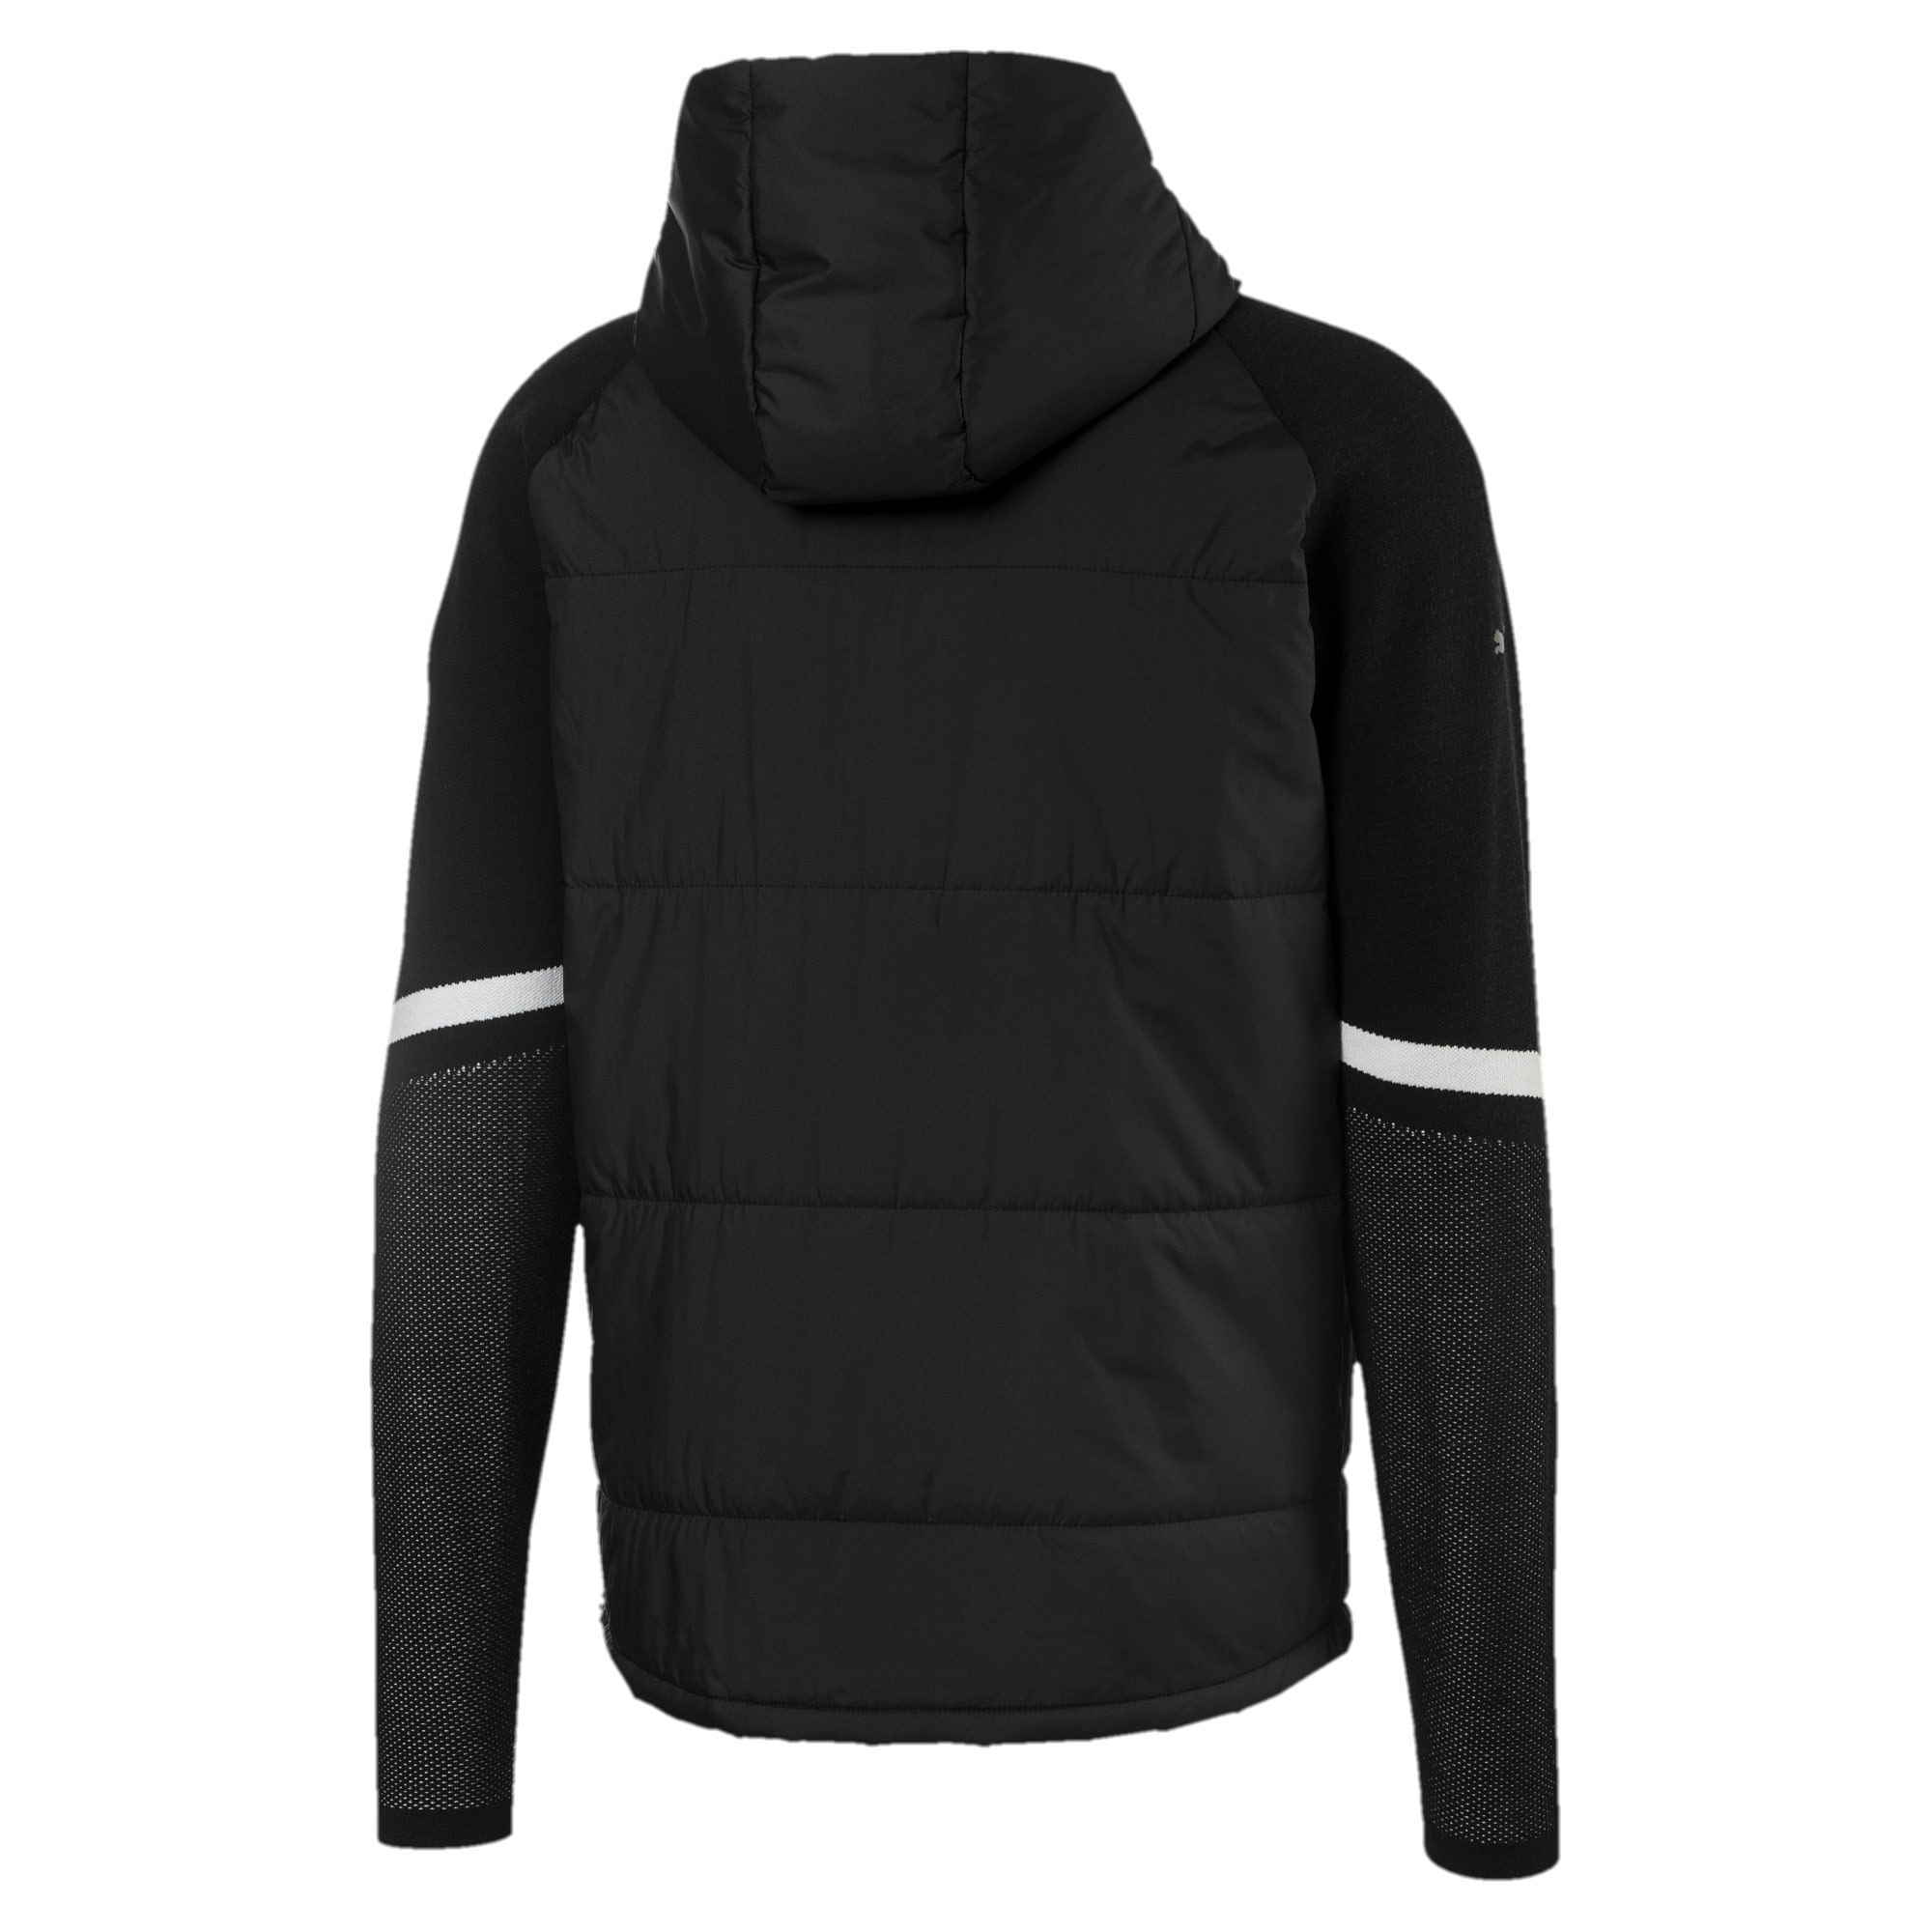 Thumbnail 2 of BMW Motorsport evoKNIT Knitted Men's Sweater, Puma Black, medium